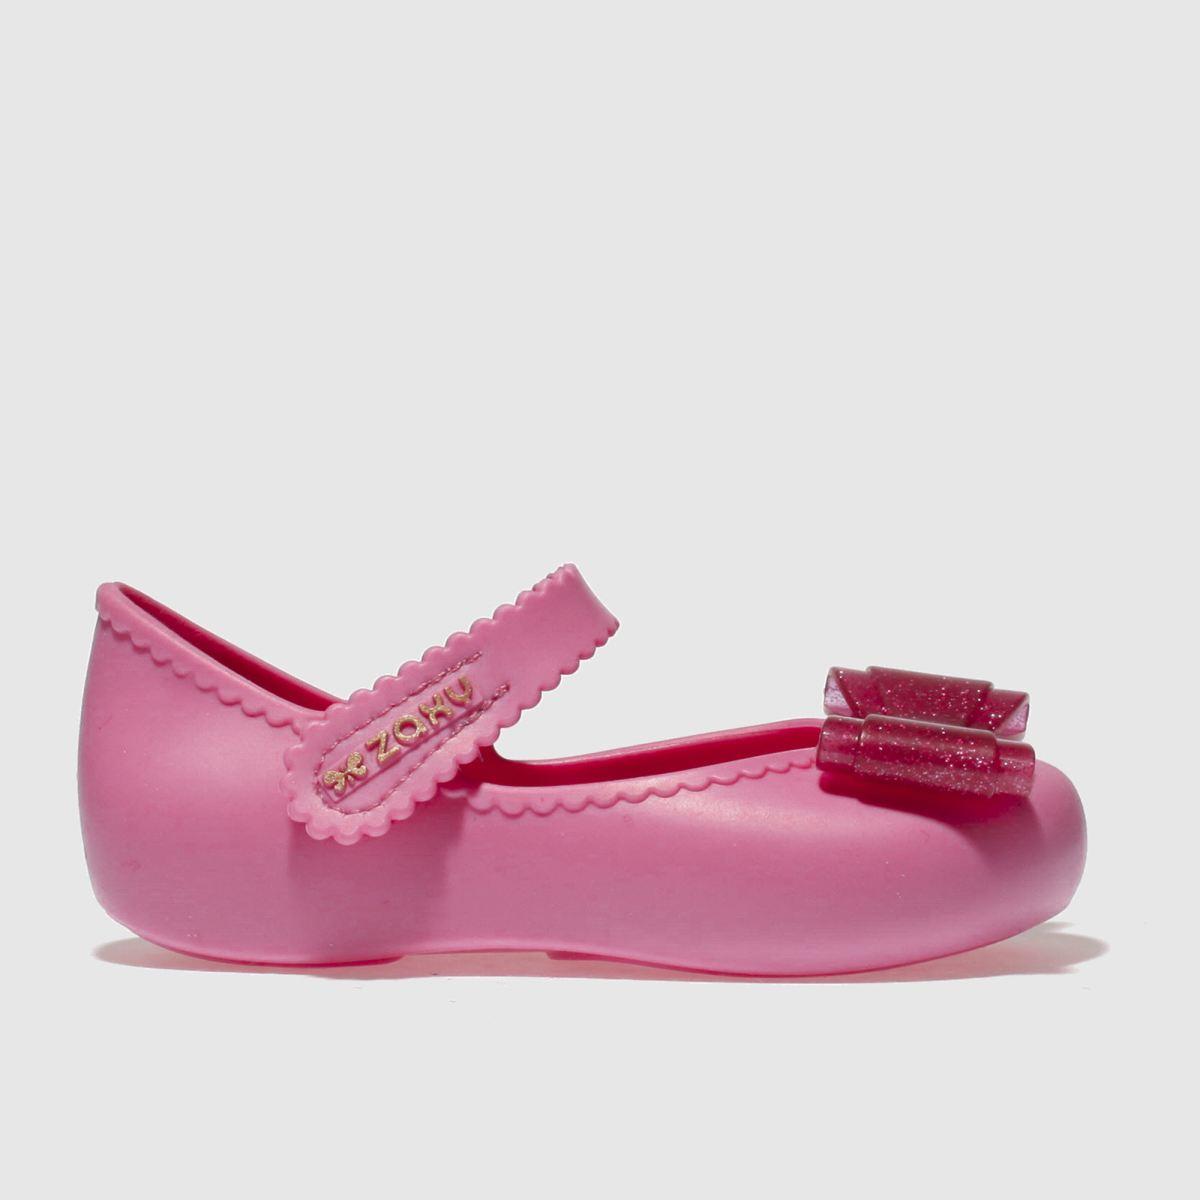 Zaxy Zaxy Pink Enchanted Bow Girls Toddler Shoes